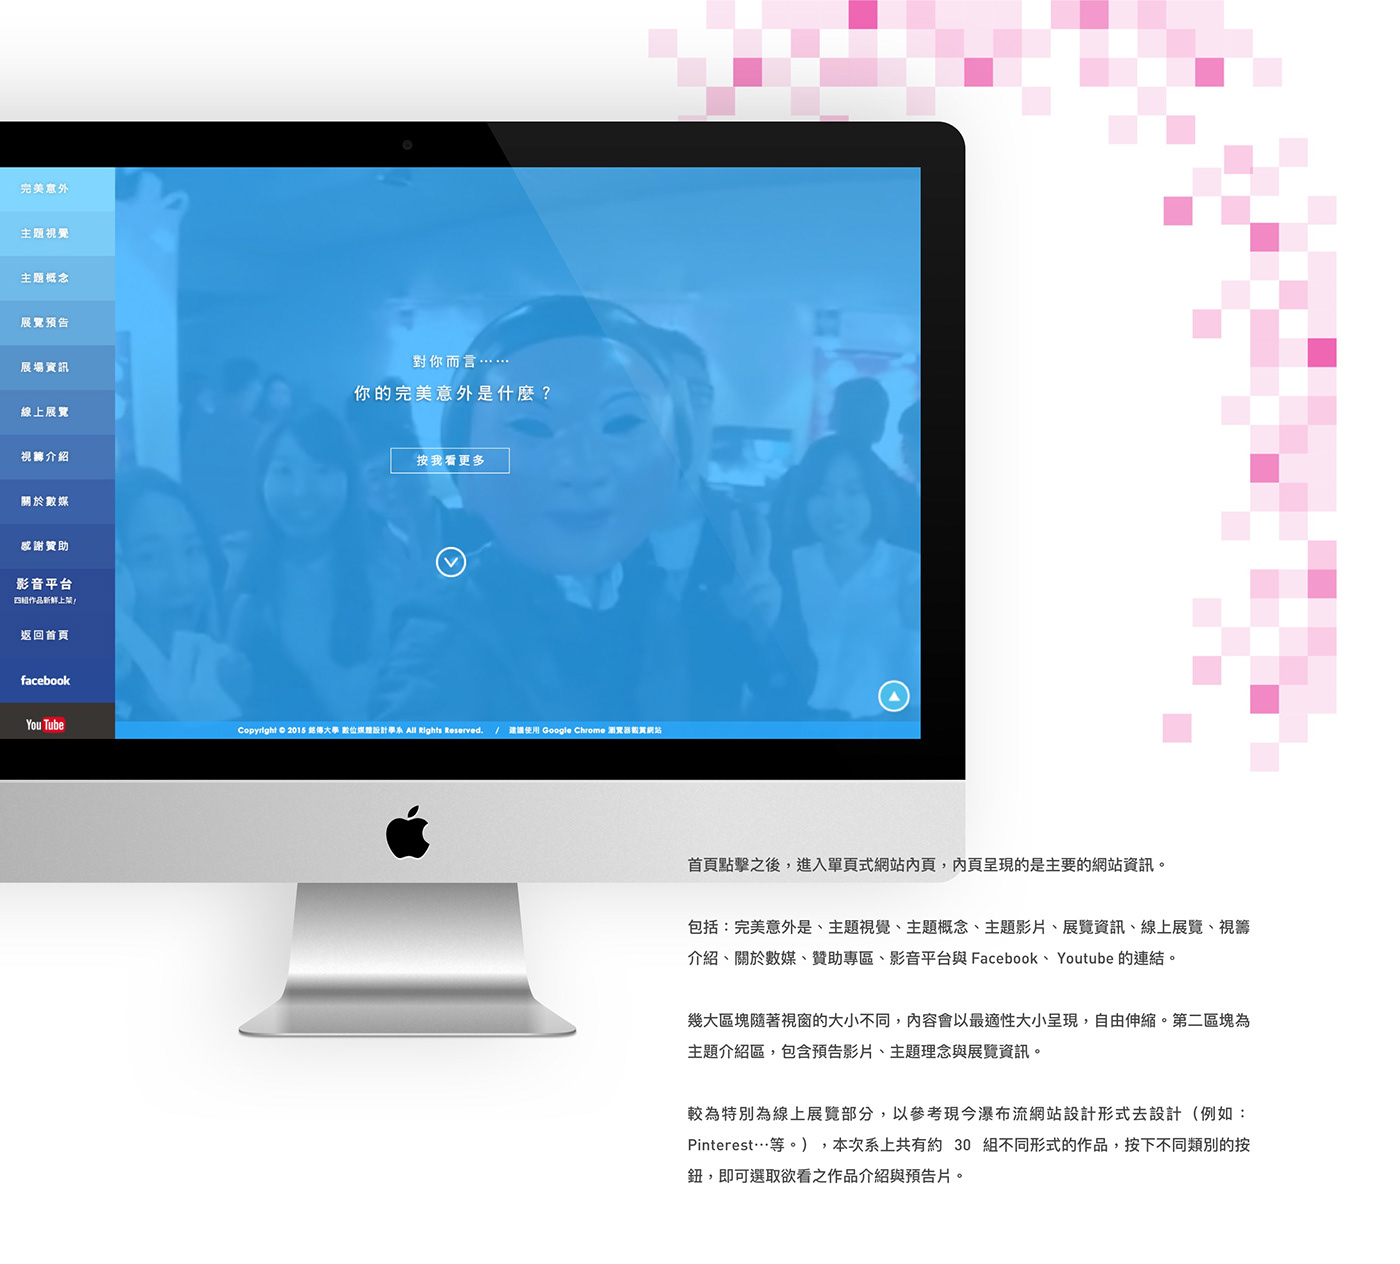 Adobe Portfolio,完美意外,銘傳,數媒系,畢業展,主視覺